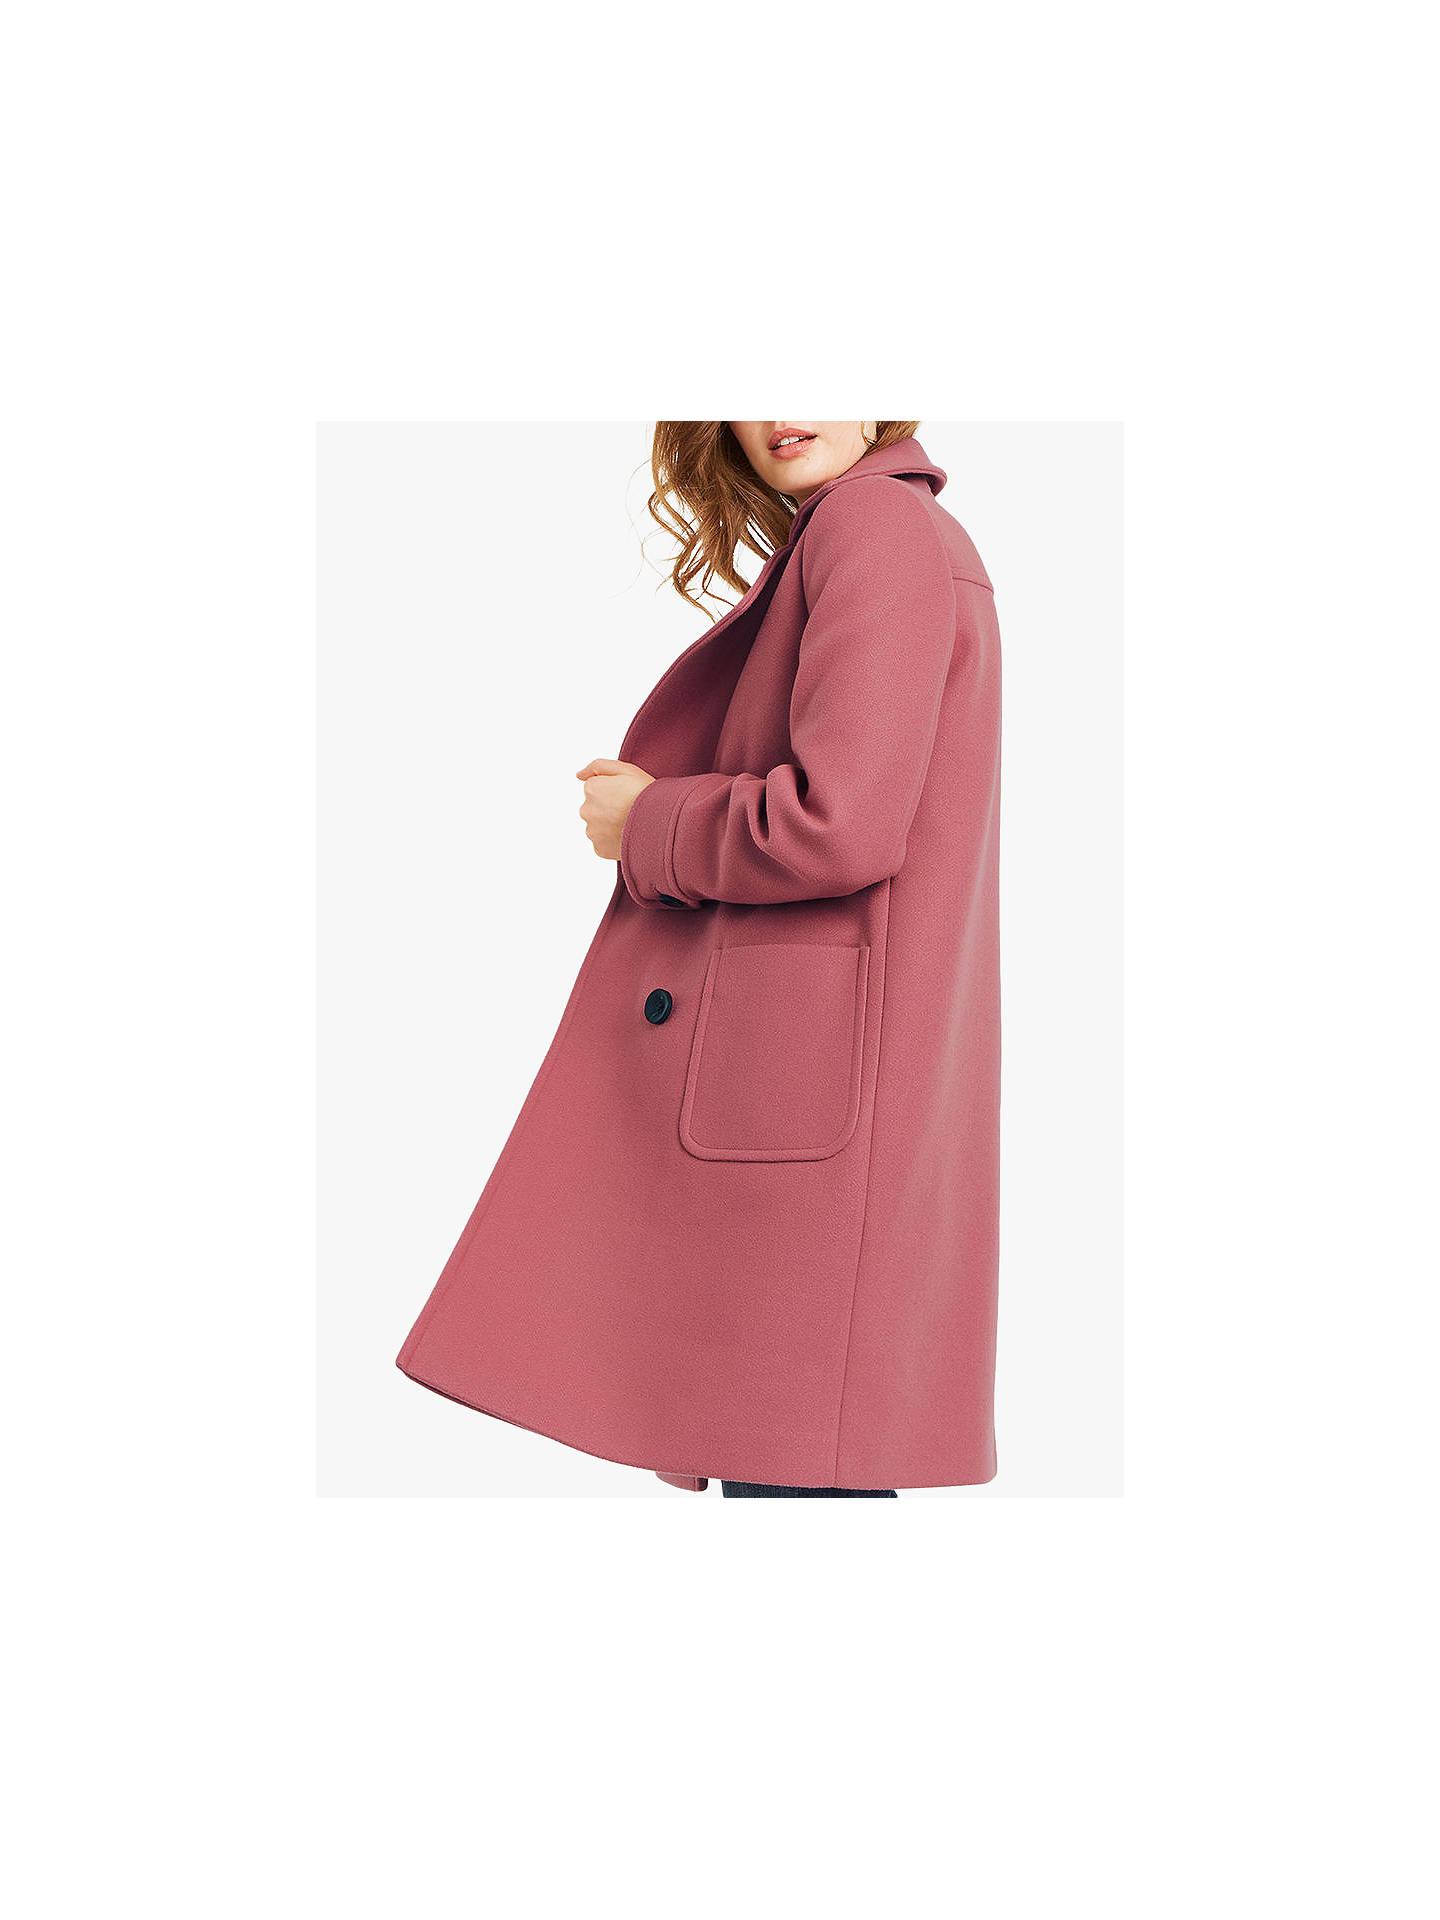 cf3ac813e996 ... Buy Oasis Charmaine Coat, Powder Pink, S Online at johnlewis.com ...